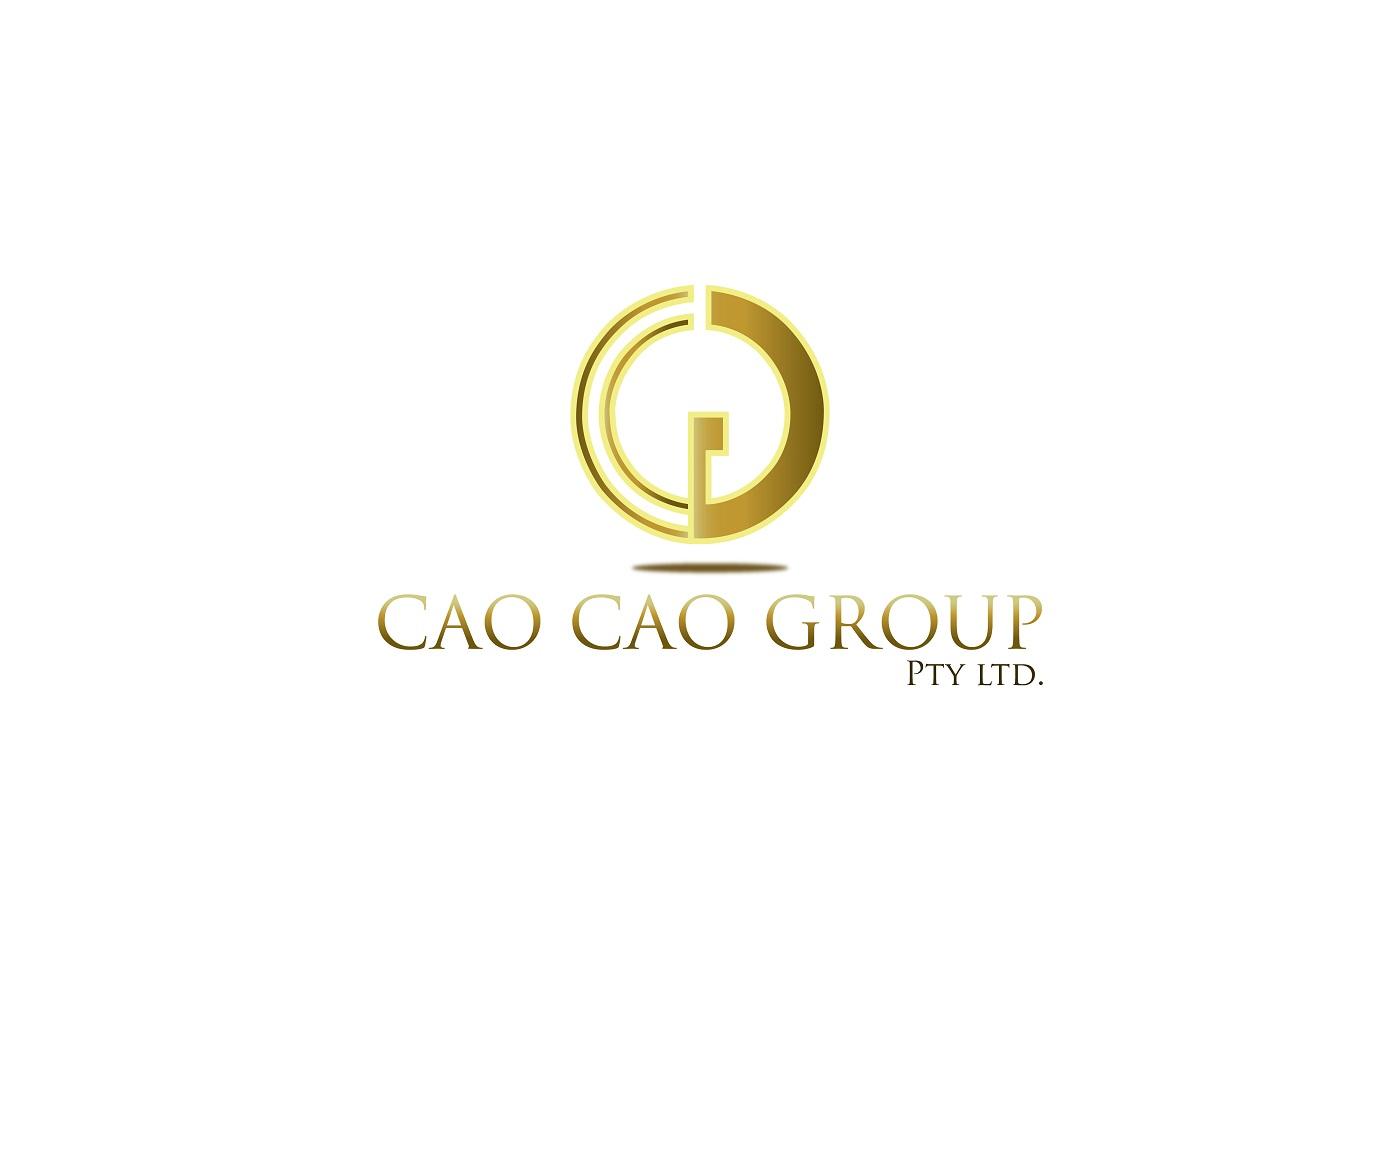 Logo Design by jhunzkie24 - Entry No. 91 in the Logo Design Contest cao cao group pty ltd Logo Design.